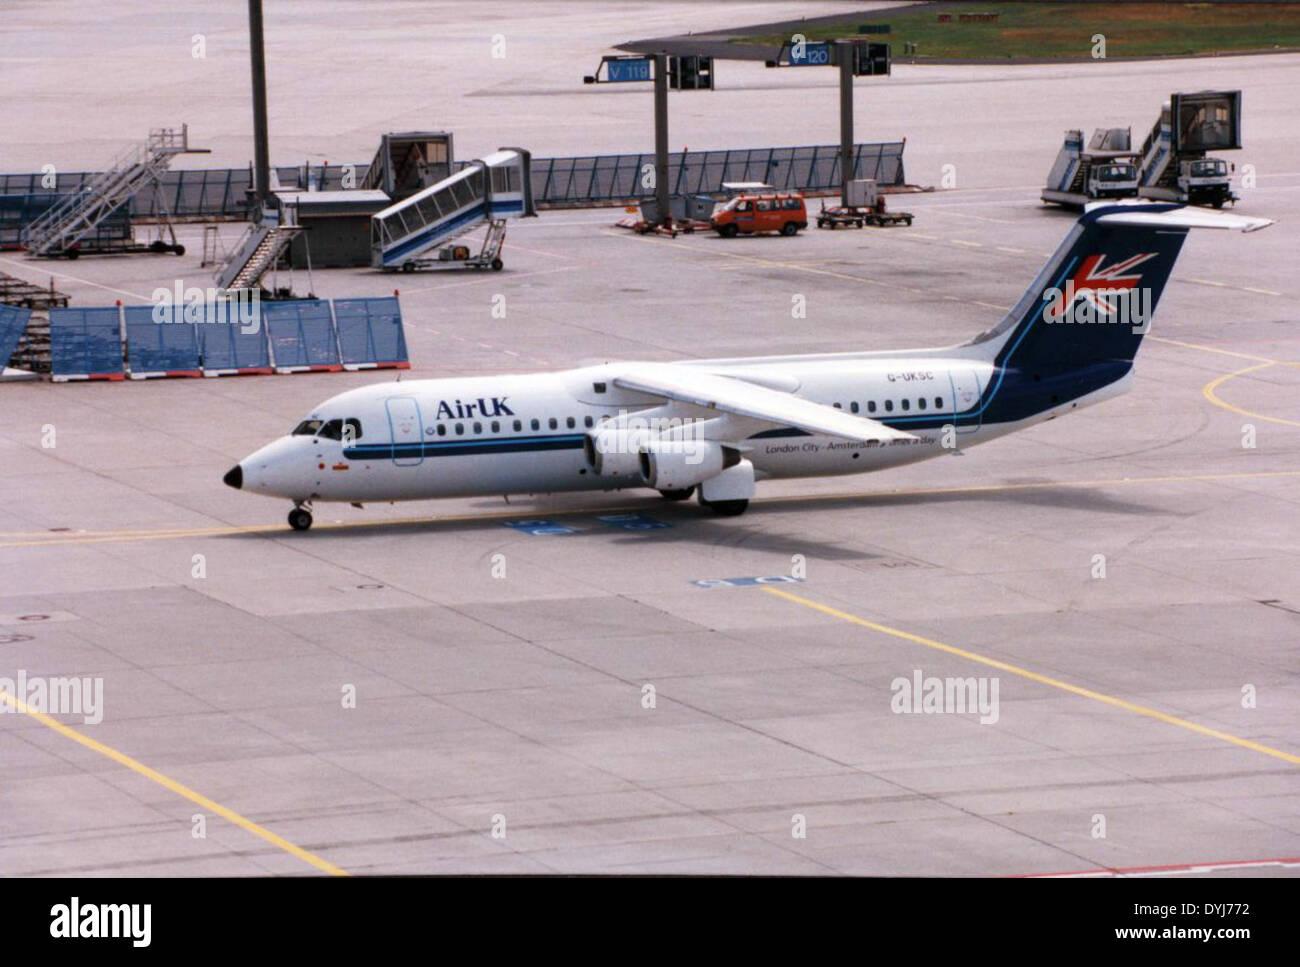 BAe-146-300 - Stock Image